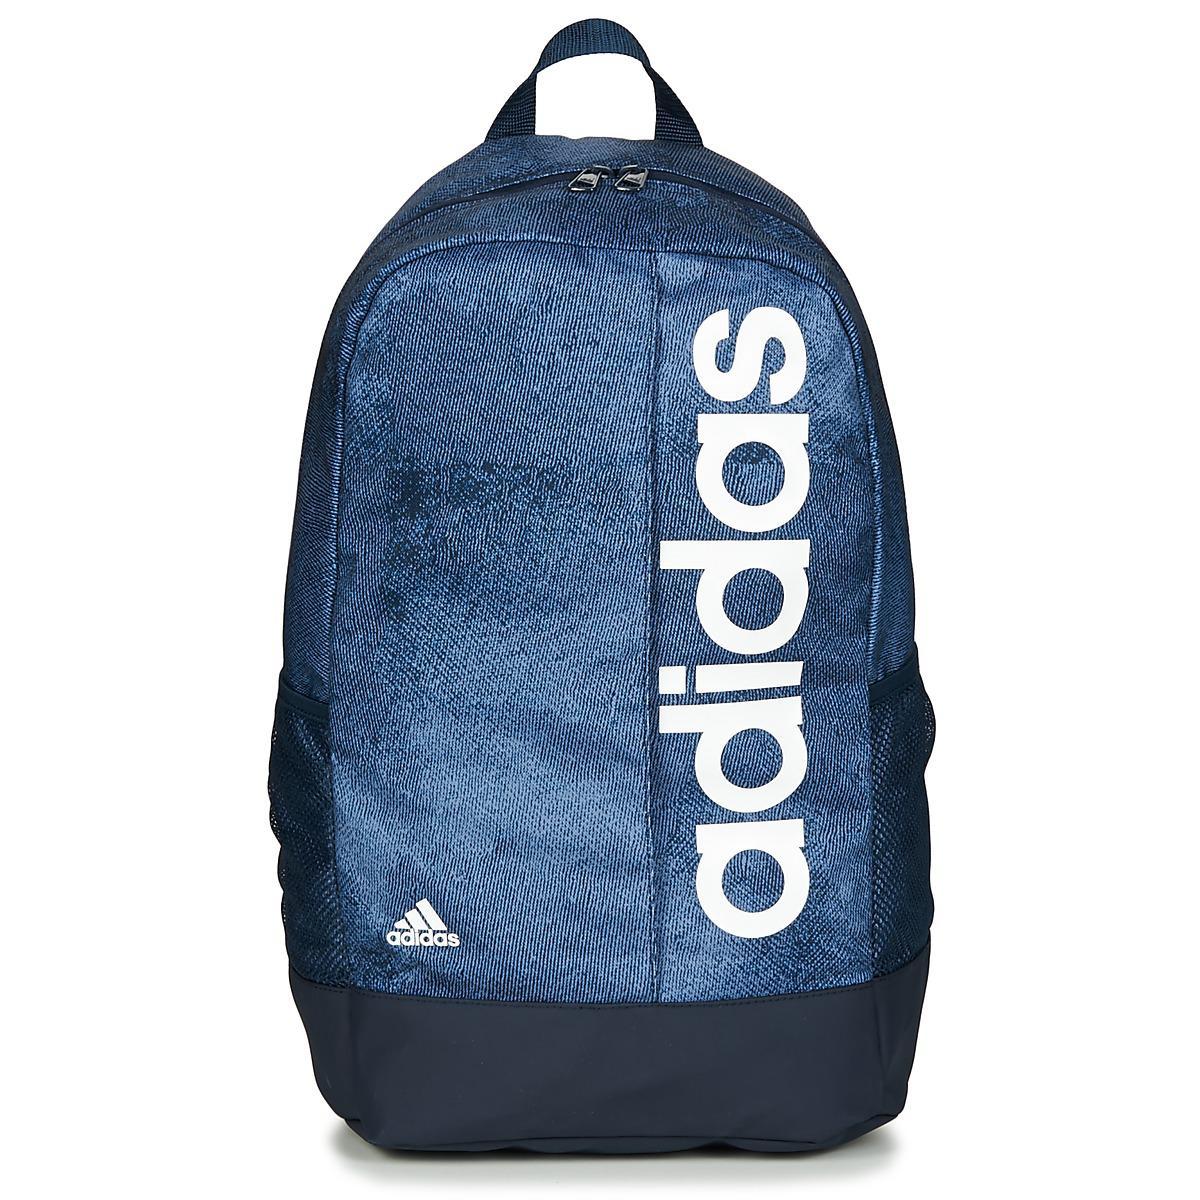 adidas Lin Per Bpck Backpack in Blue for Men - Lyst 78715faeda2f7